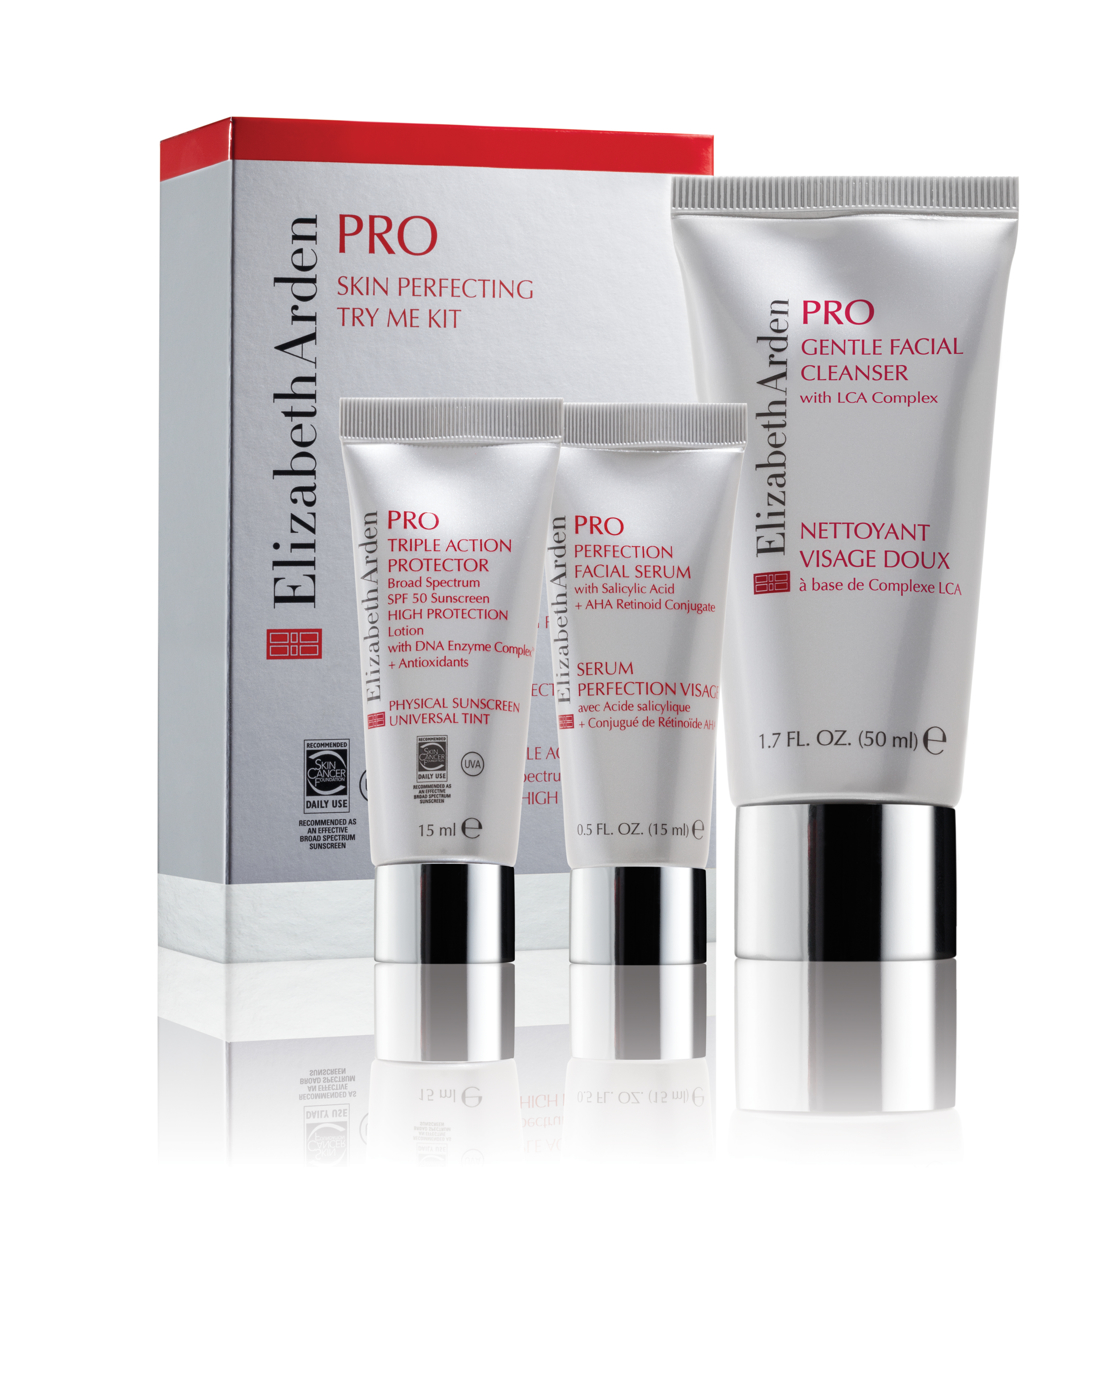 Skin_Perfecting_try_me_kit